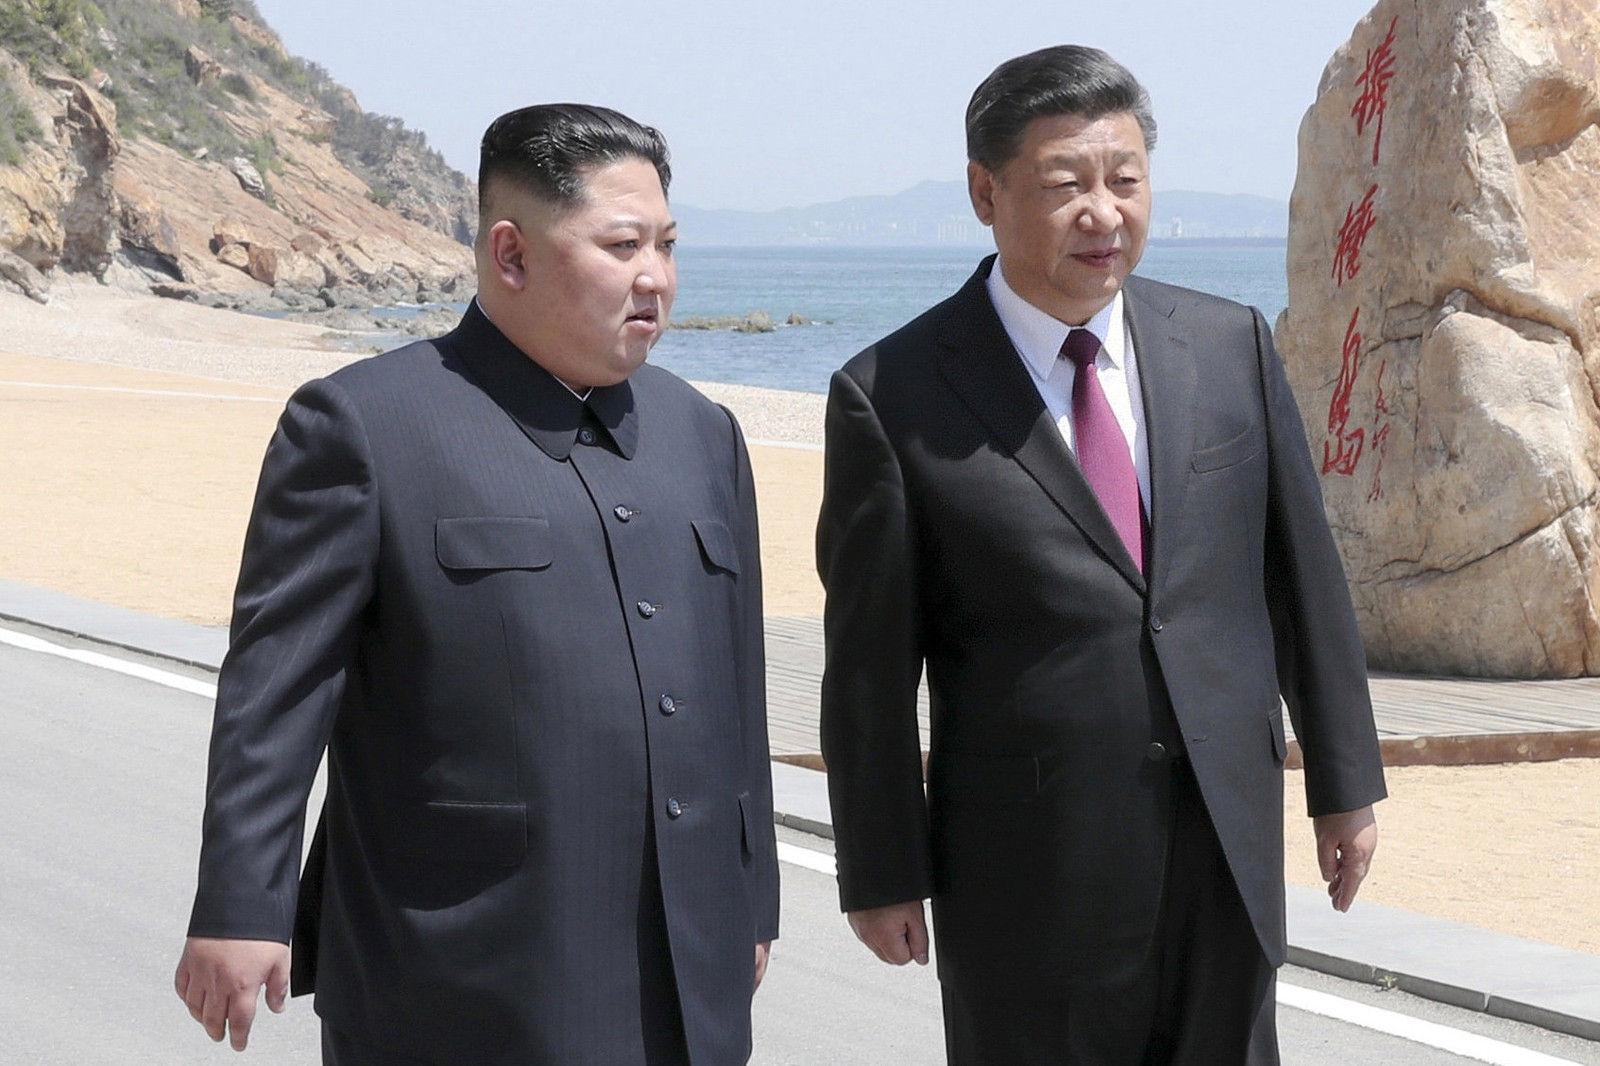 Ши Жиньпин анх удаа Умард Солонгост айлчлахаар боллоо